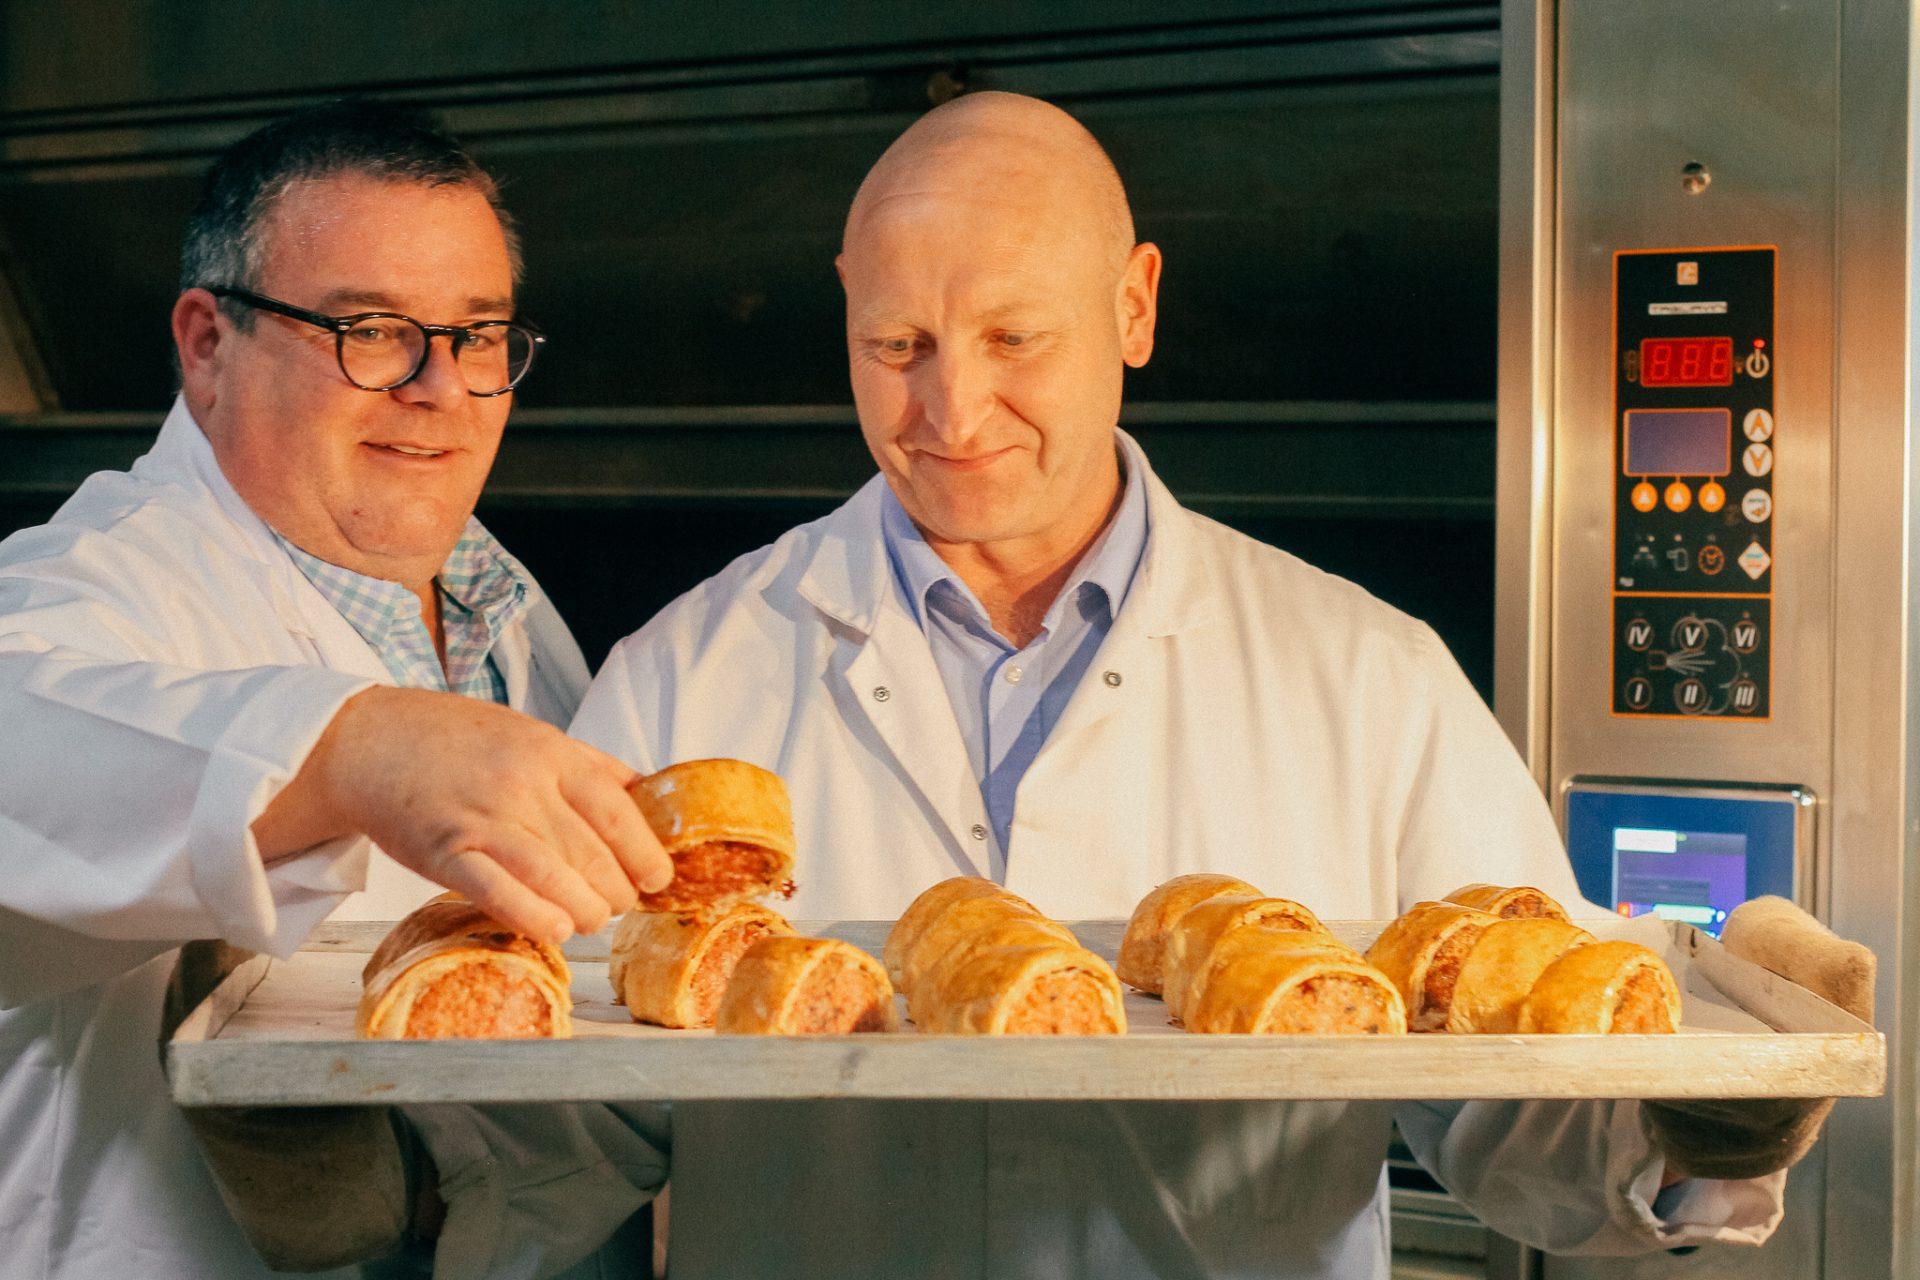 Simon Thomas and Steve Cockayne from Thomas the Baker inspecting the award-winning Deli Black Pudding Sausage Rolls